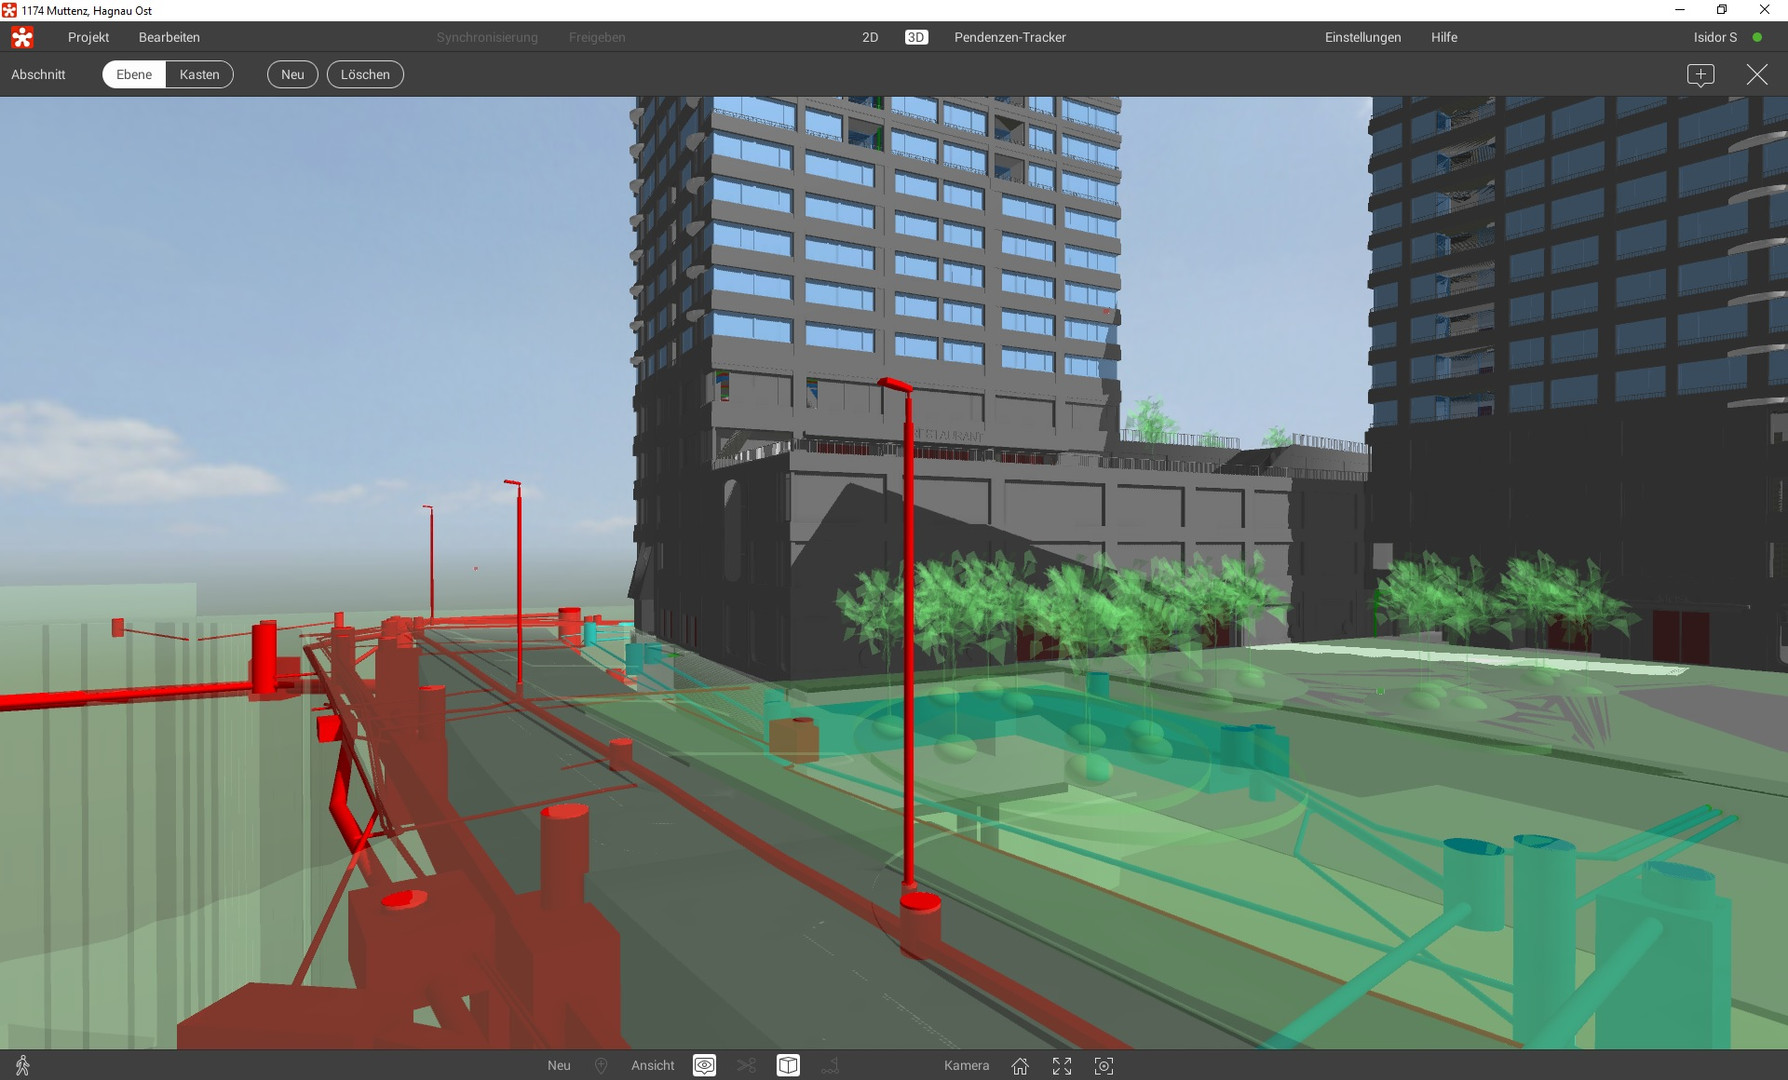 3D-Modell im Viewer, Projekt Hagnau Ost in Muttenz